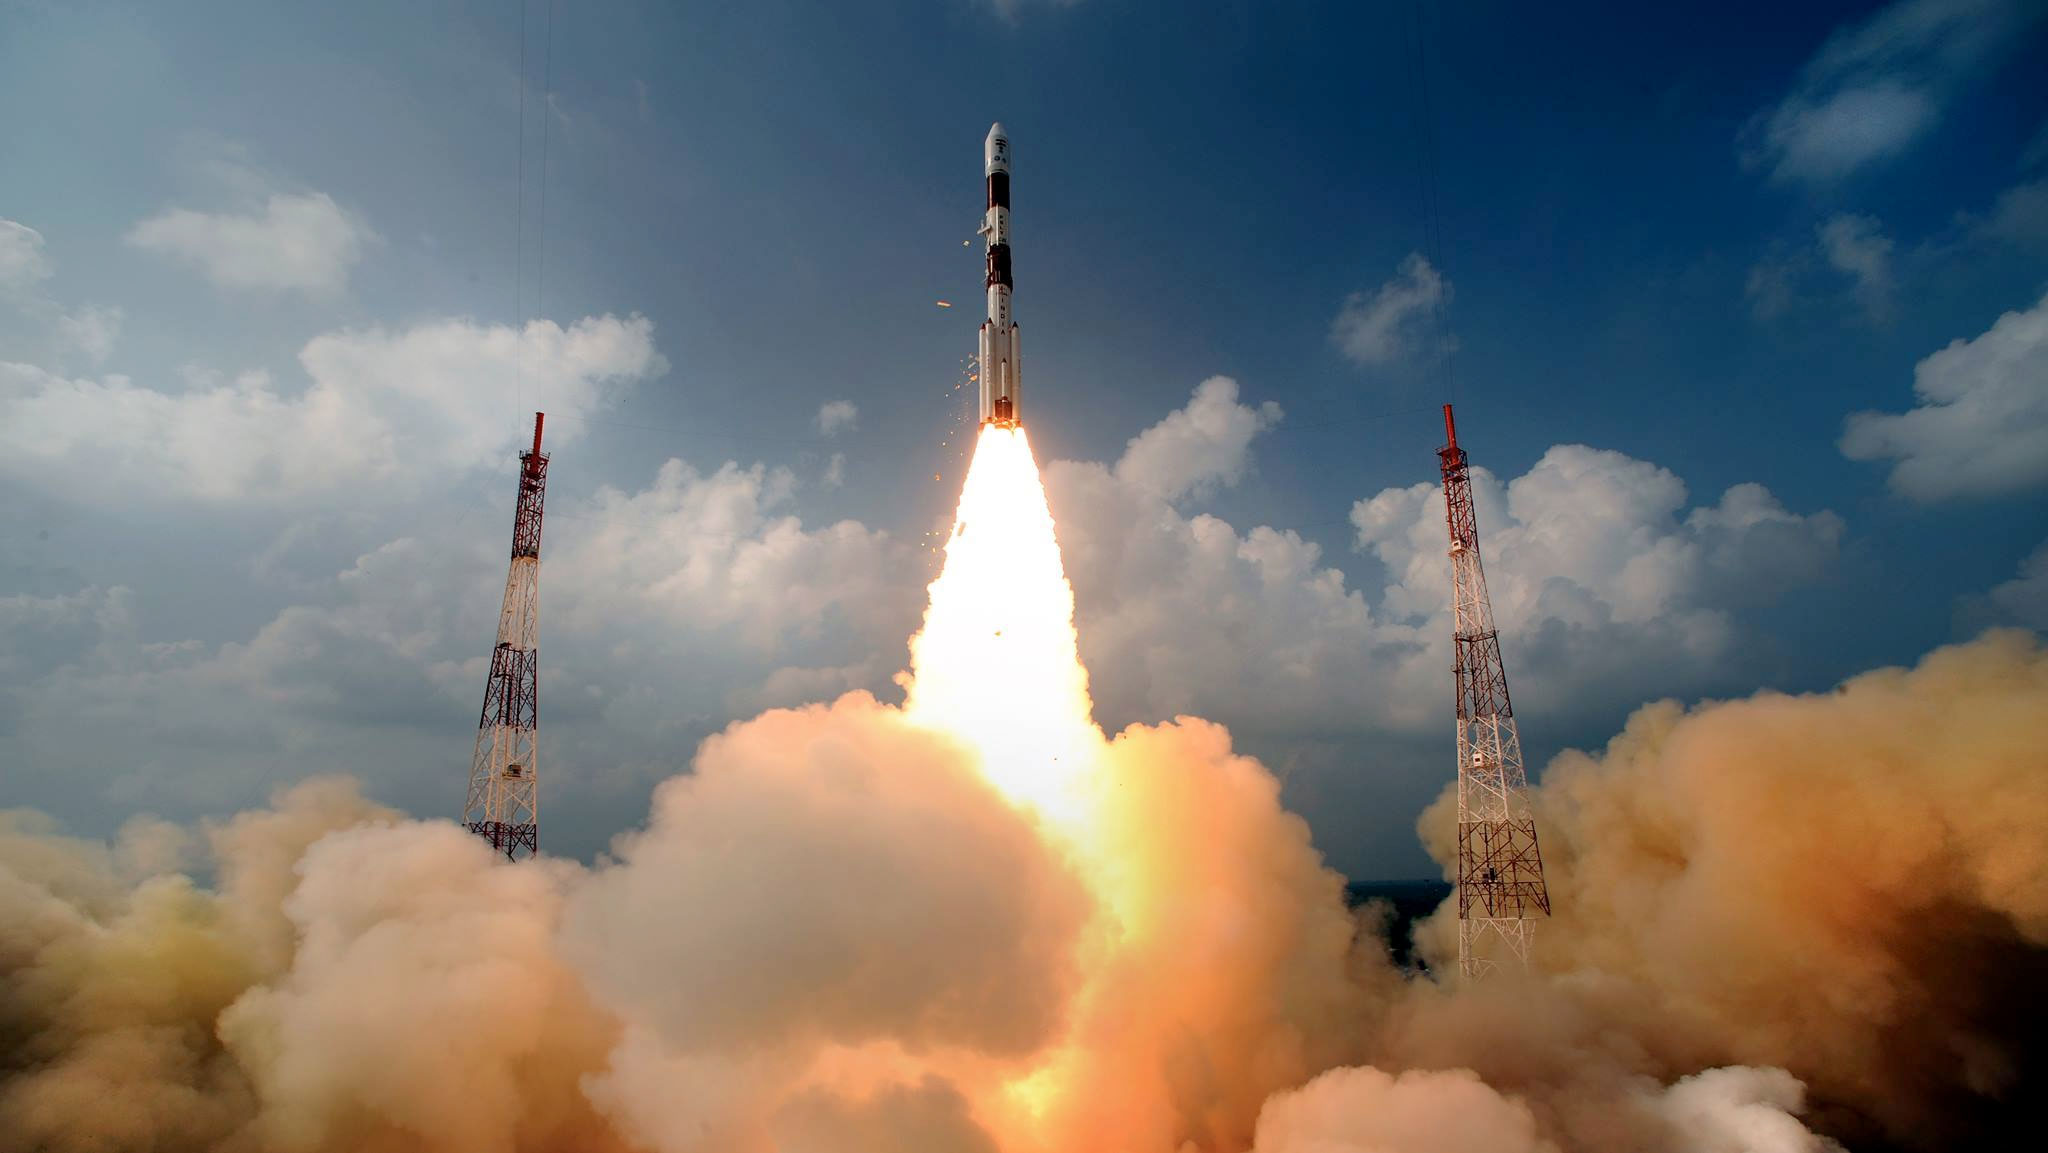 ISRO, PSLV-38, Satellite, Cartosat-2, Polar Satellite Launch Vehicle, Sriharikota, Science & Technology news